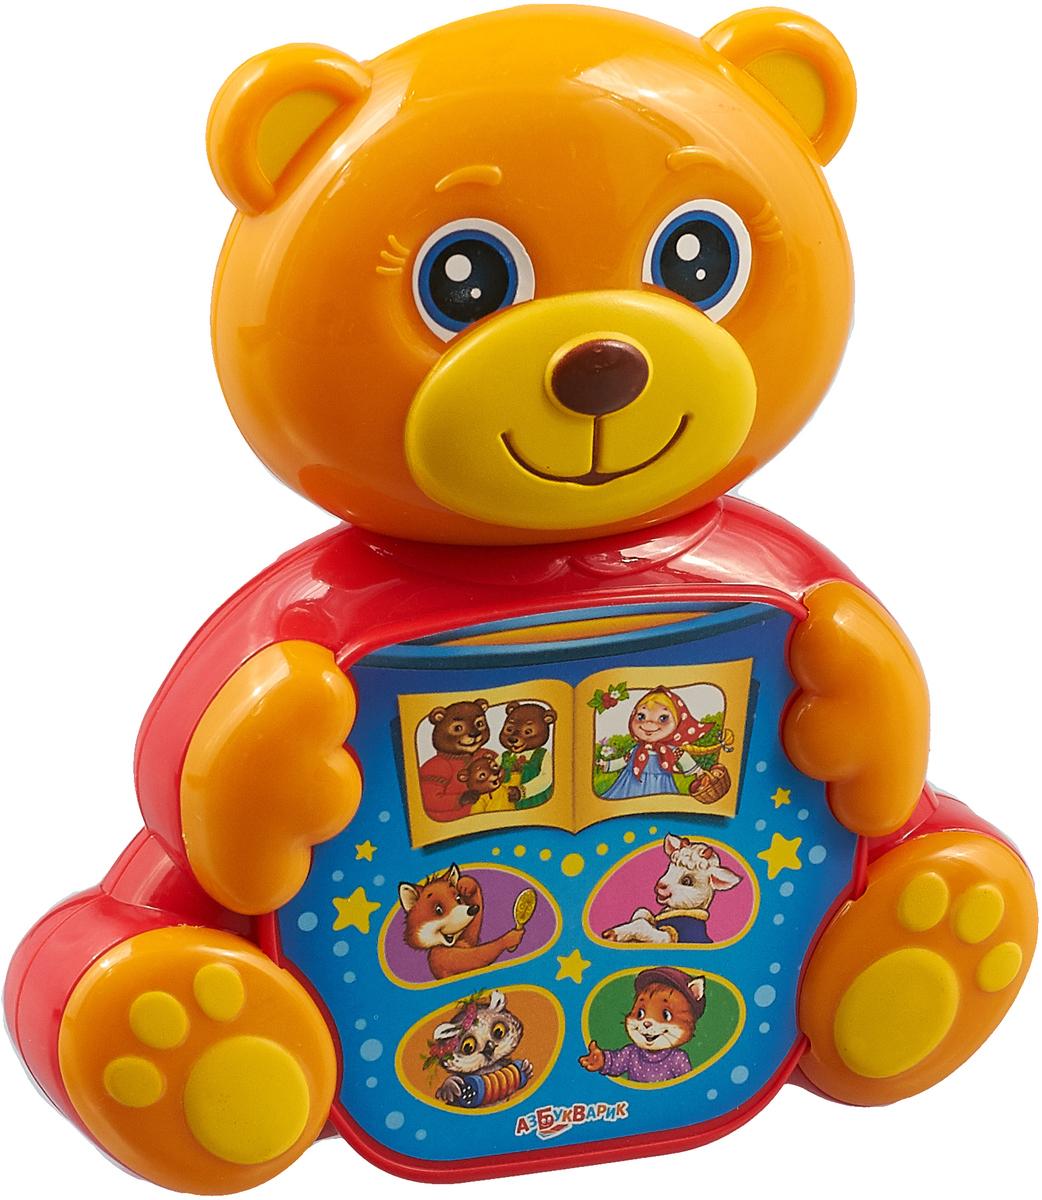 Музыкальная игрушка Азбукварик Любимая сказочка. Мишка косолапый азбукварик электронная музыкальная игрушка курочка ряба